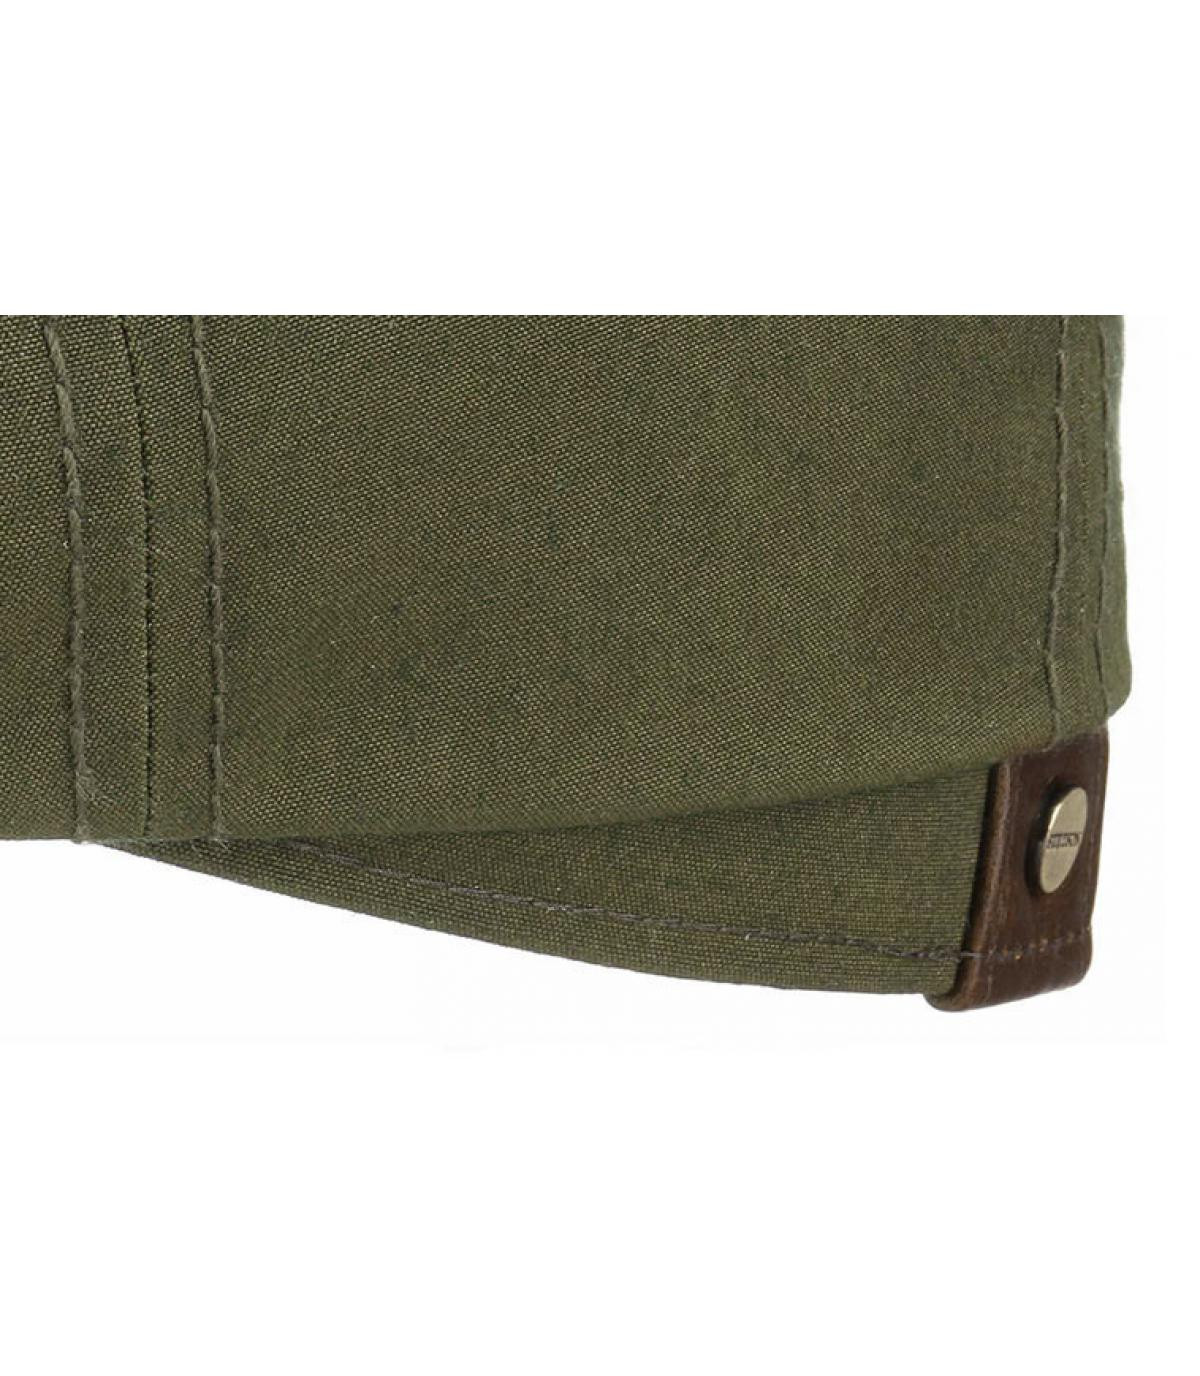 Détails Hatteras waxed coton leather olive - image 3